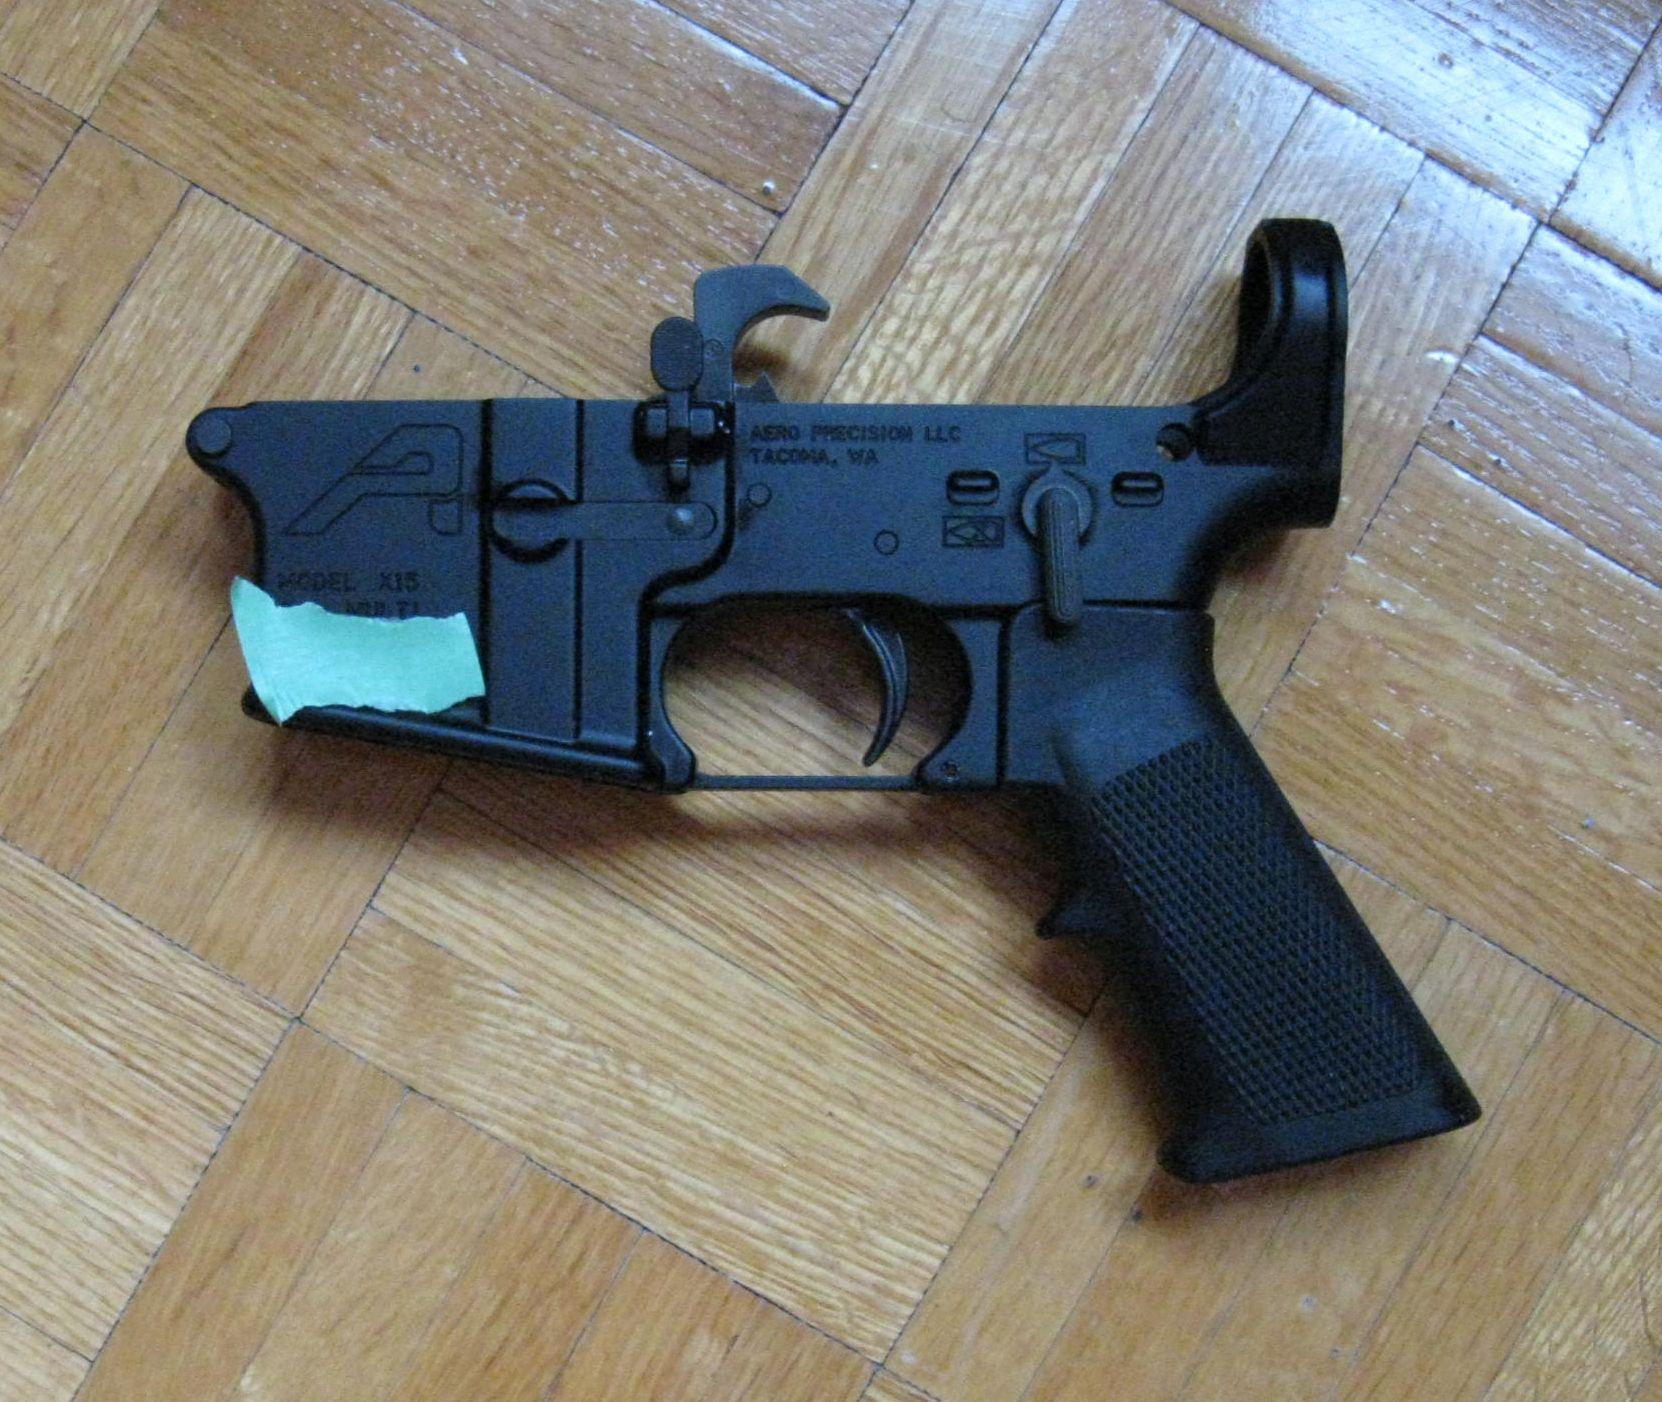 SVP achetez un AR-15! - Page 12 Semi_a10